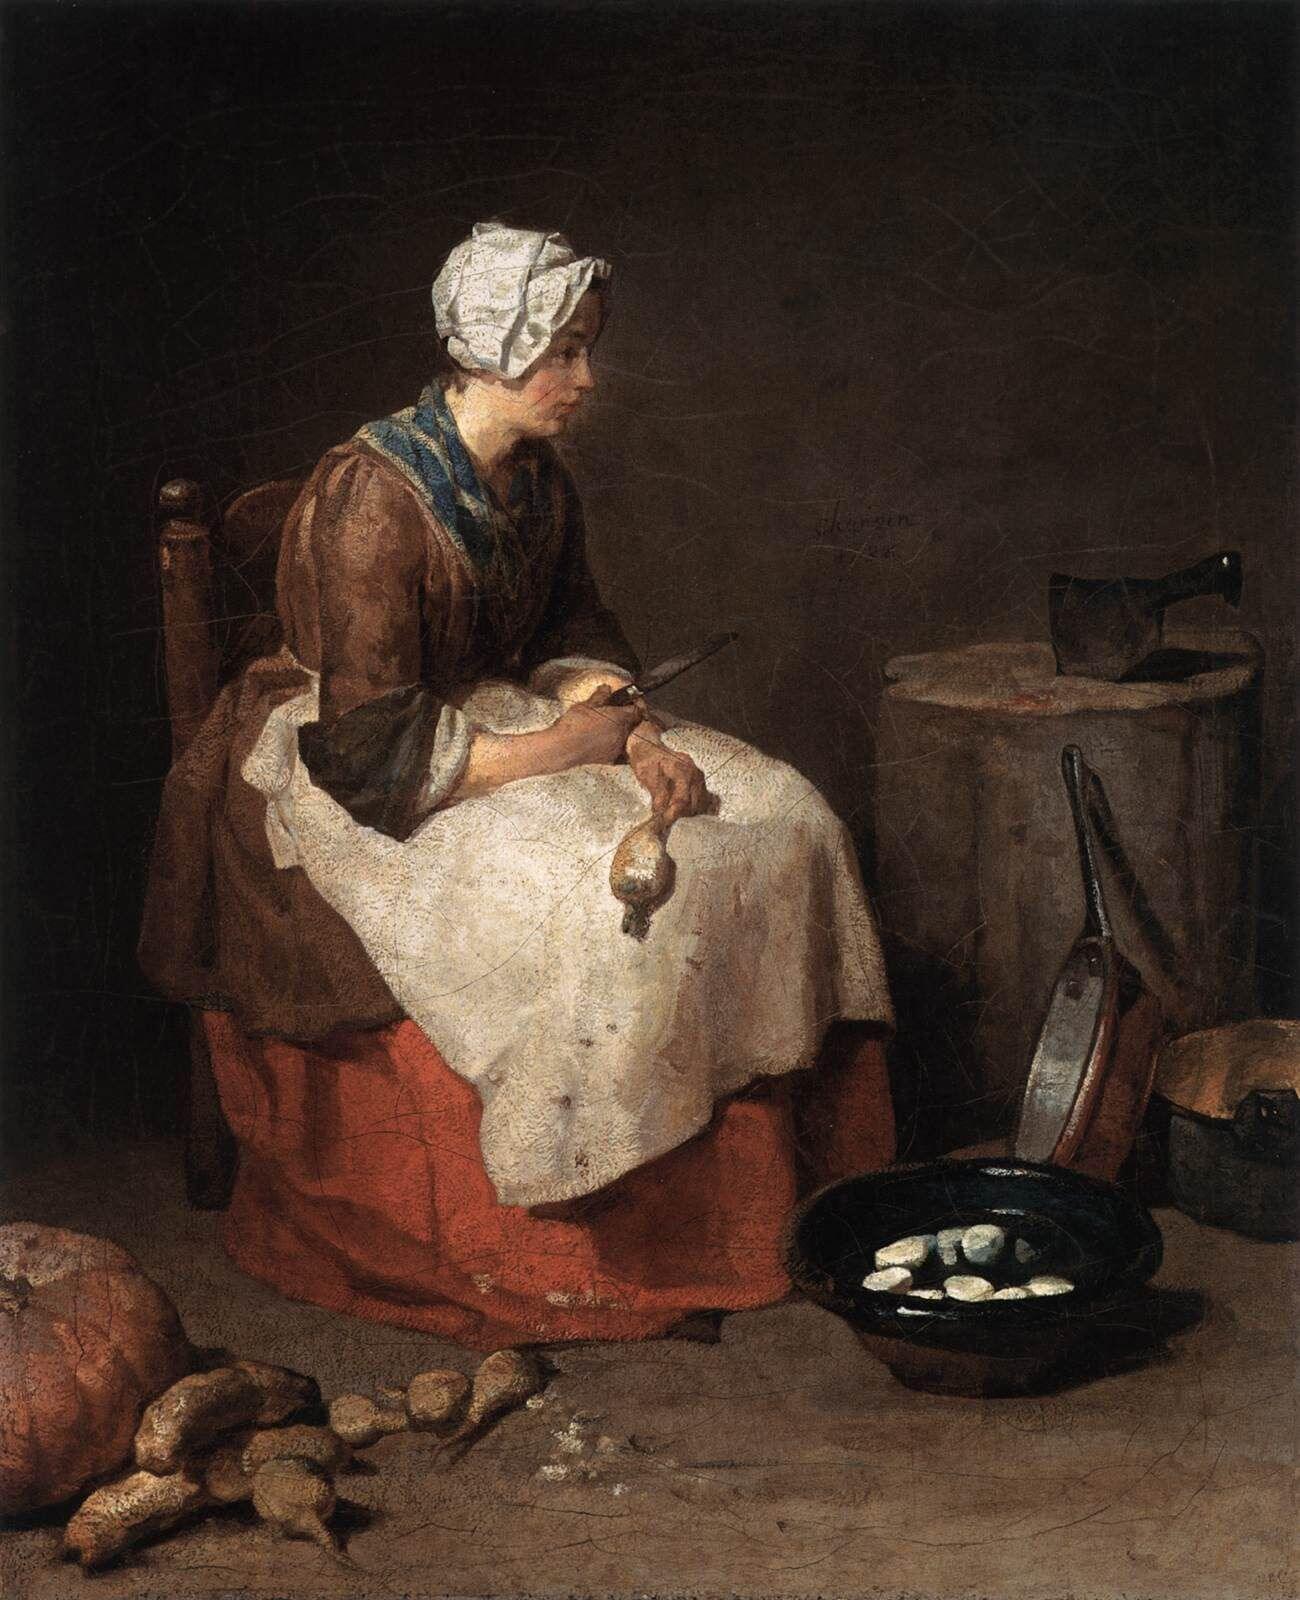 Jean Siméon Chardin, <i>The Turnip Scraper</i> [also known as <i>The Kitchen Maid</i>], 1738, Washington National Gallery of Art